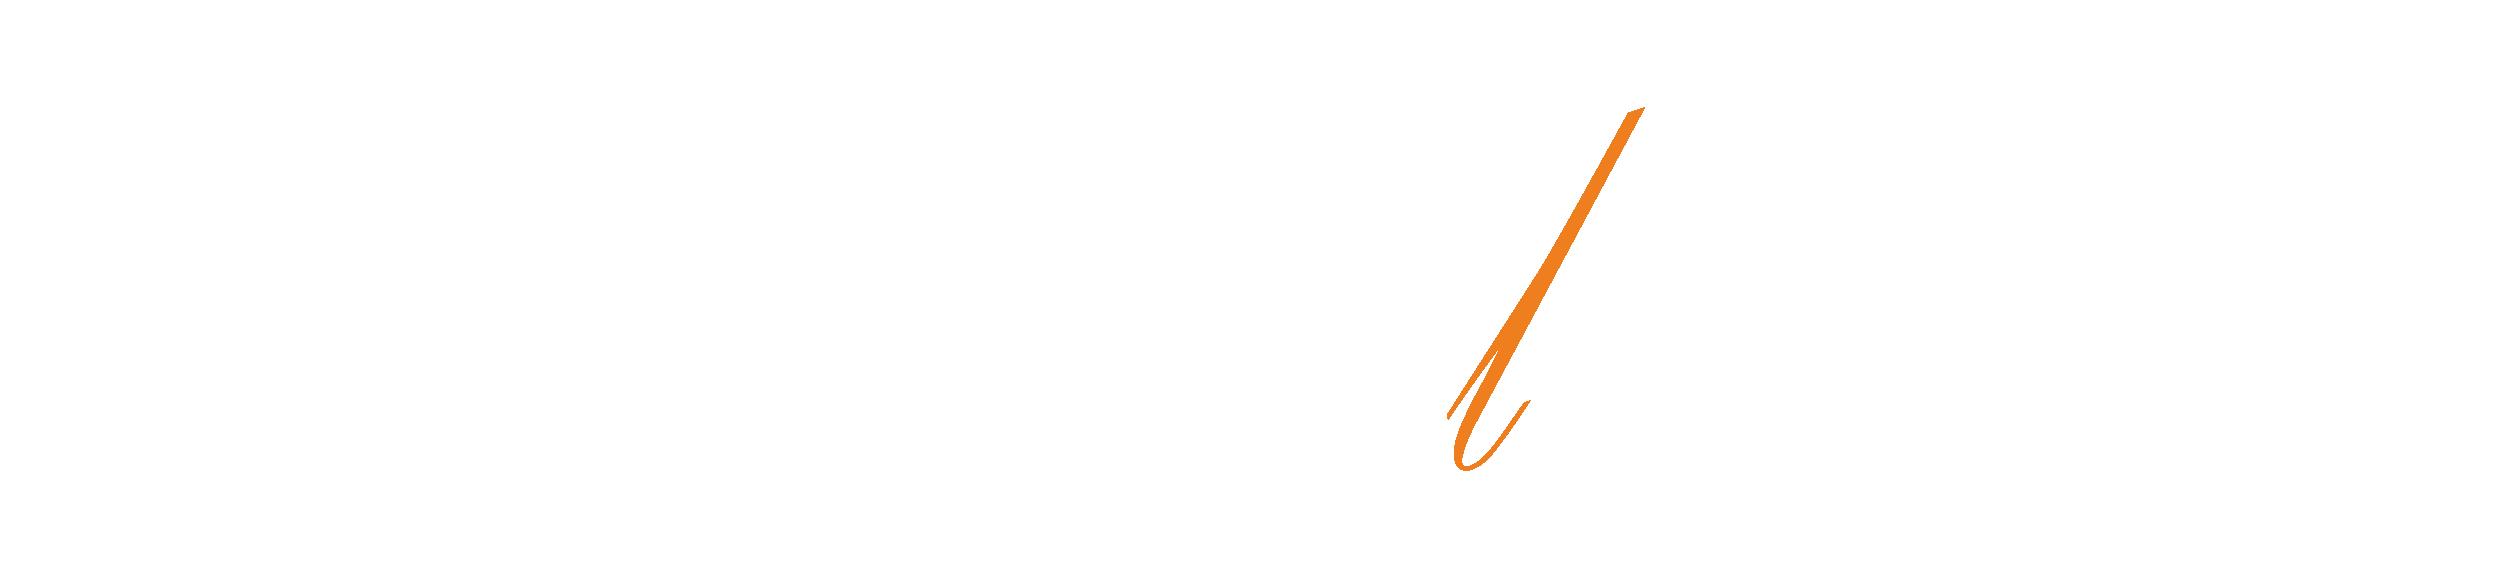 Atölye Mola